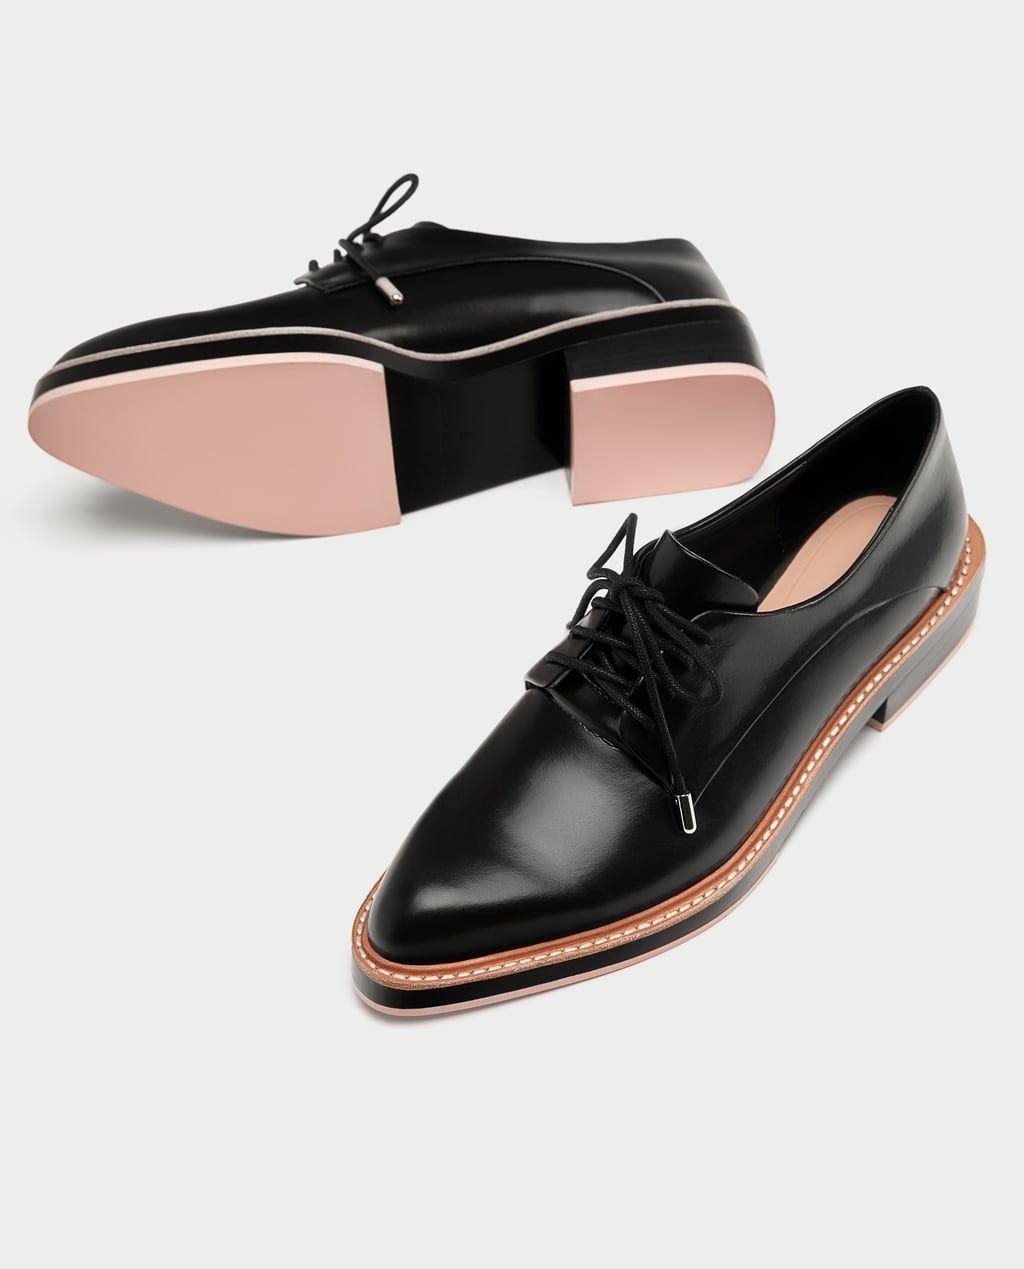 Zara Woman Derby Shoes With Coloured Soles Extravagante Schuhe Schuhe Damen Schuhe Frauen